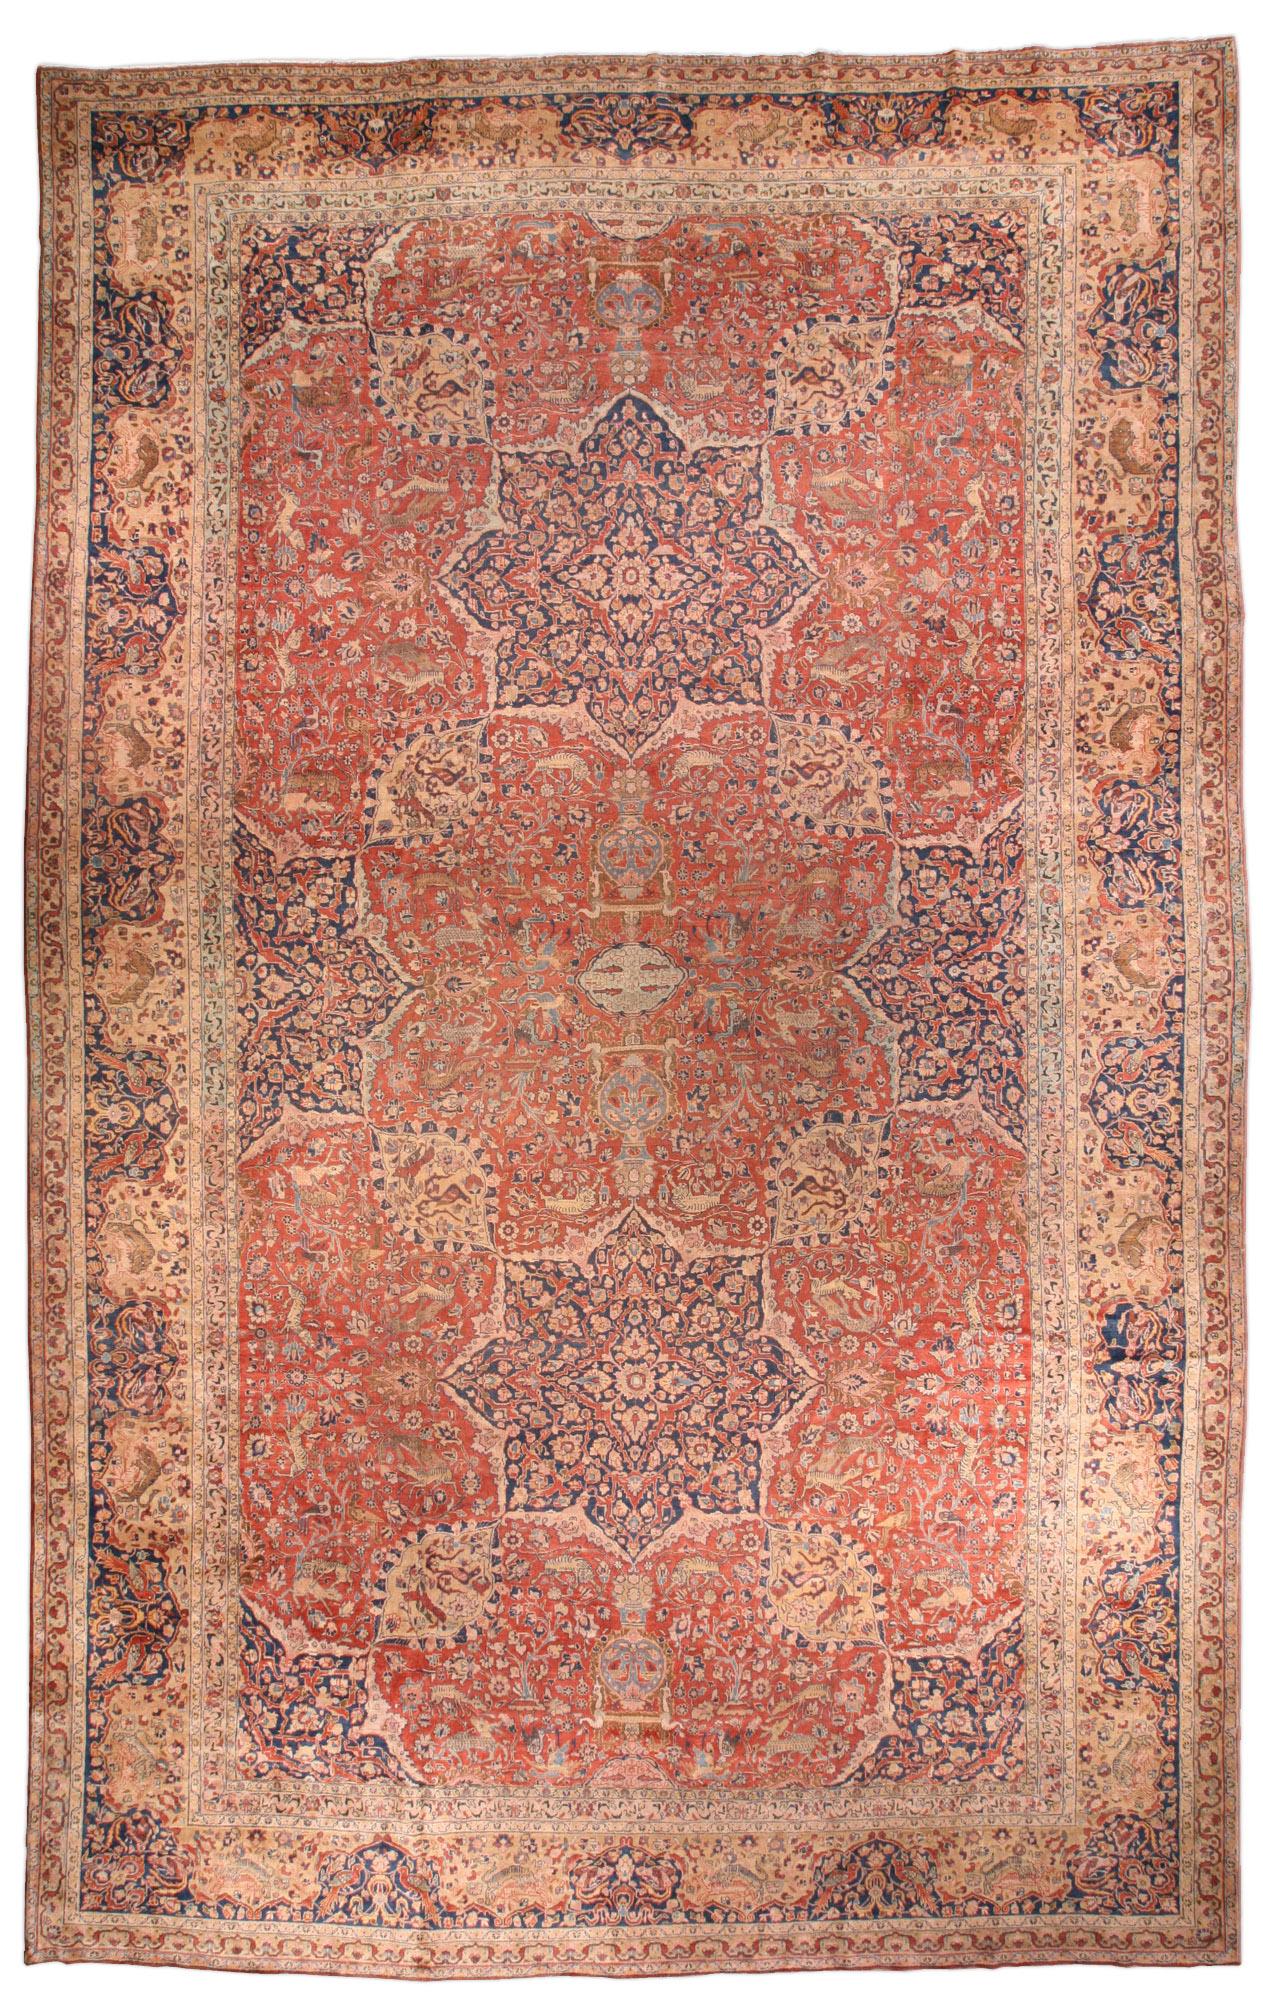 Antique Persian Tabriz Carpet BB1596